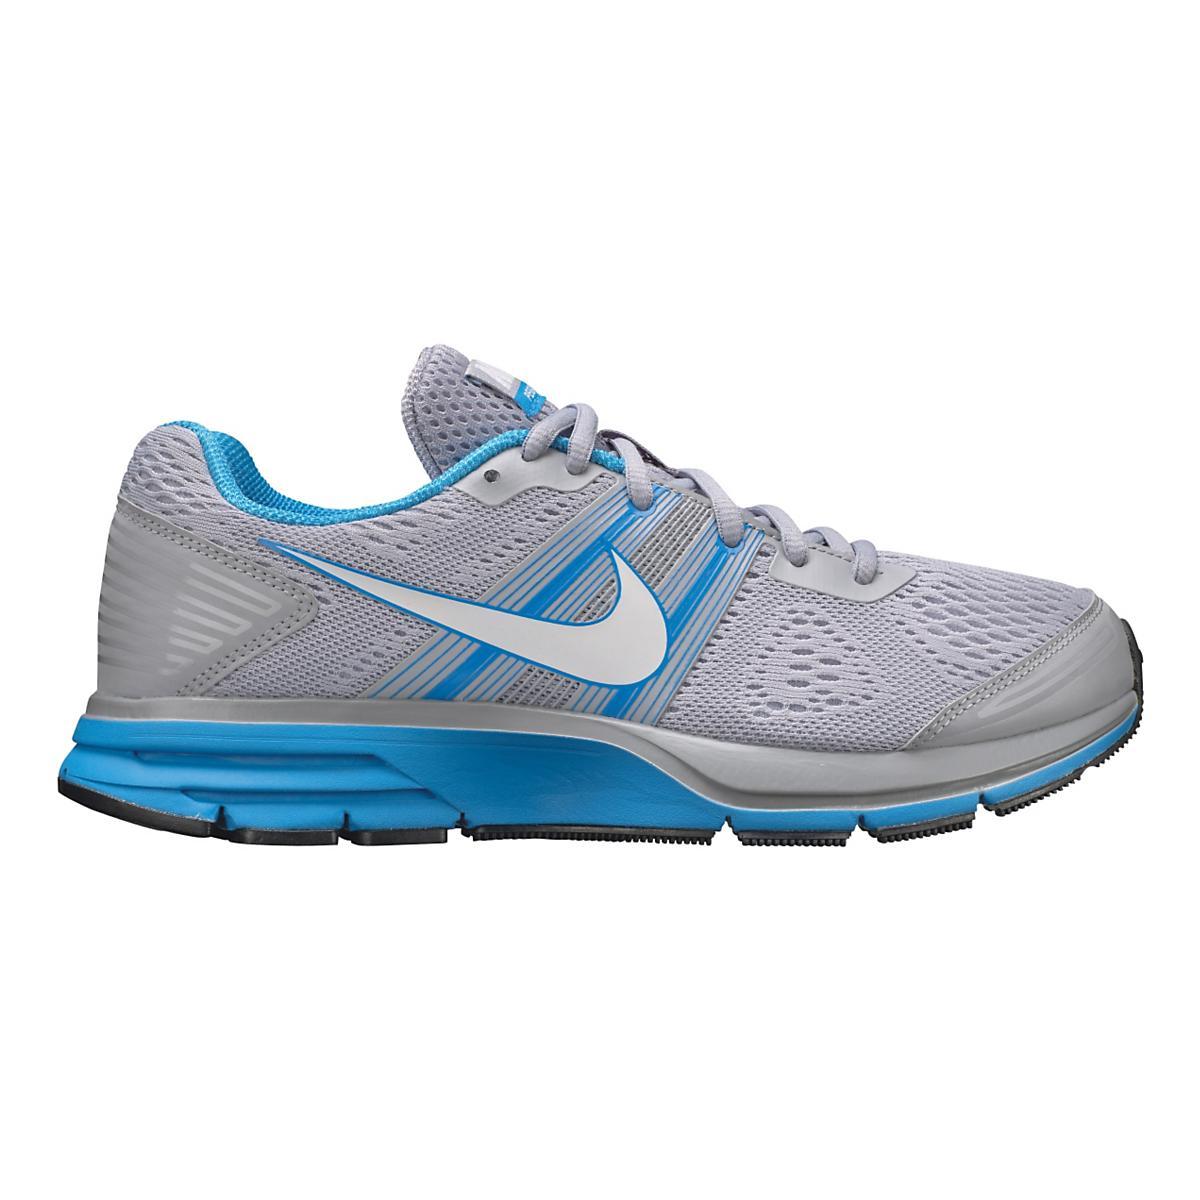 Air Road 29 Pegasus Sports Womens At Runner Running Nike Shoe PvqBn7UZ